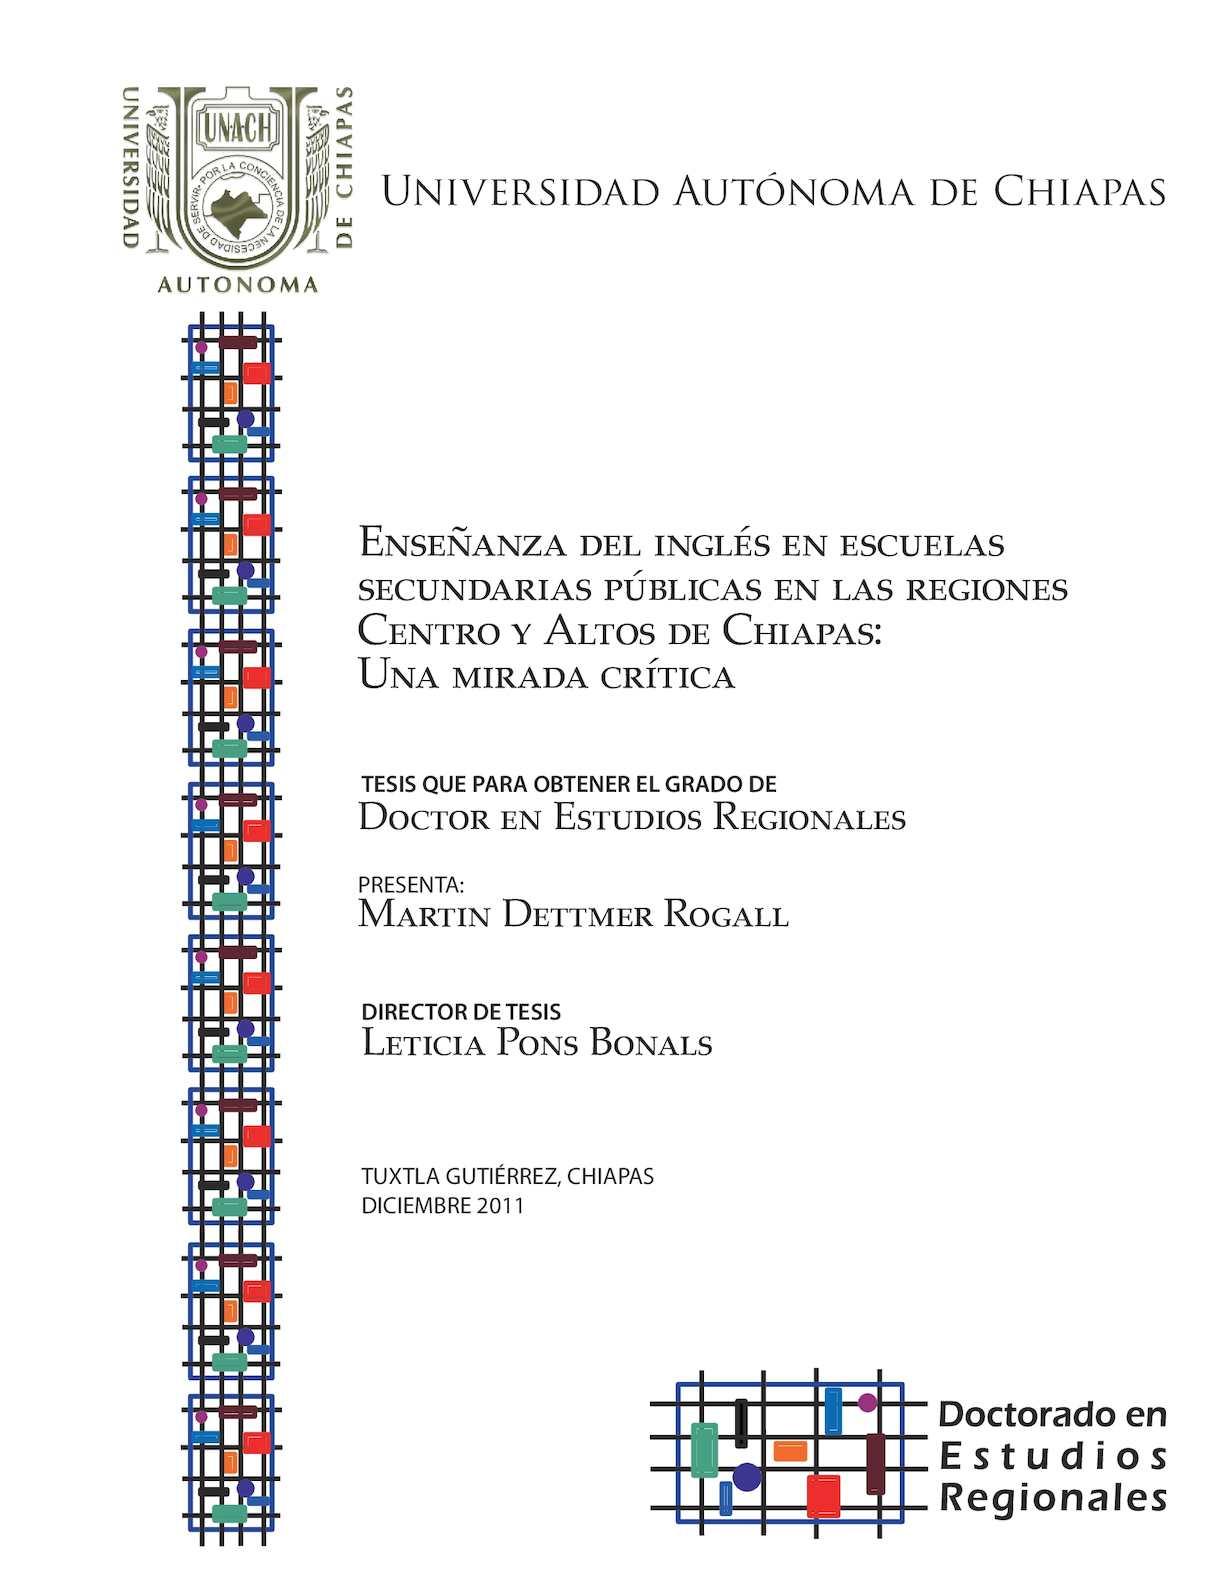 Calaméo - Tesis Doctoral Martin Dettmer Rogall